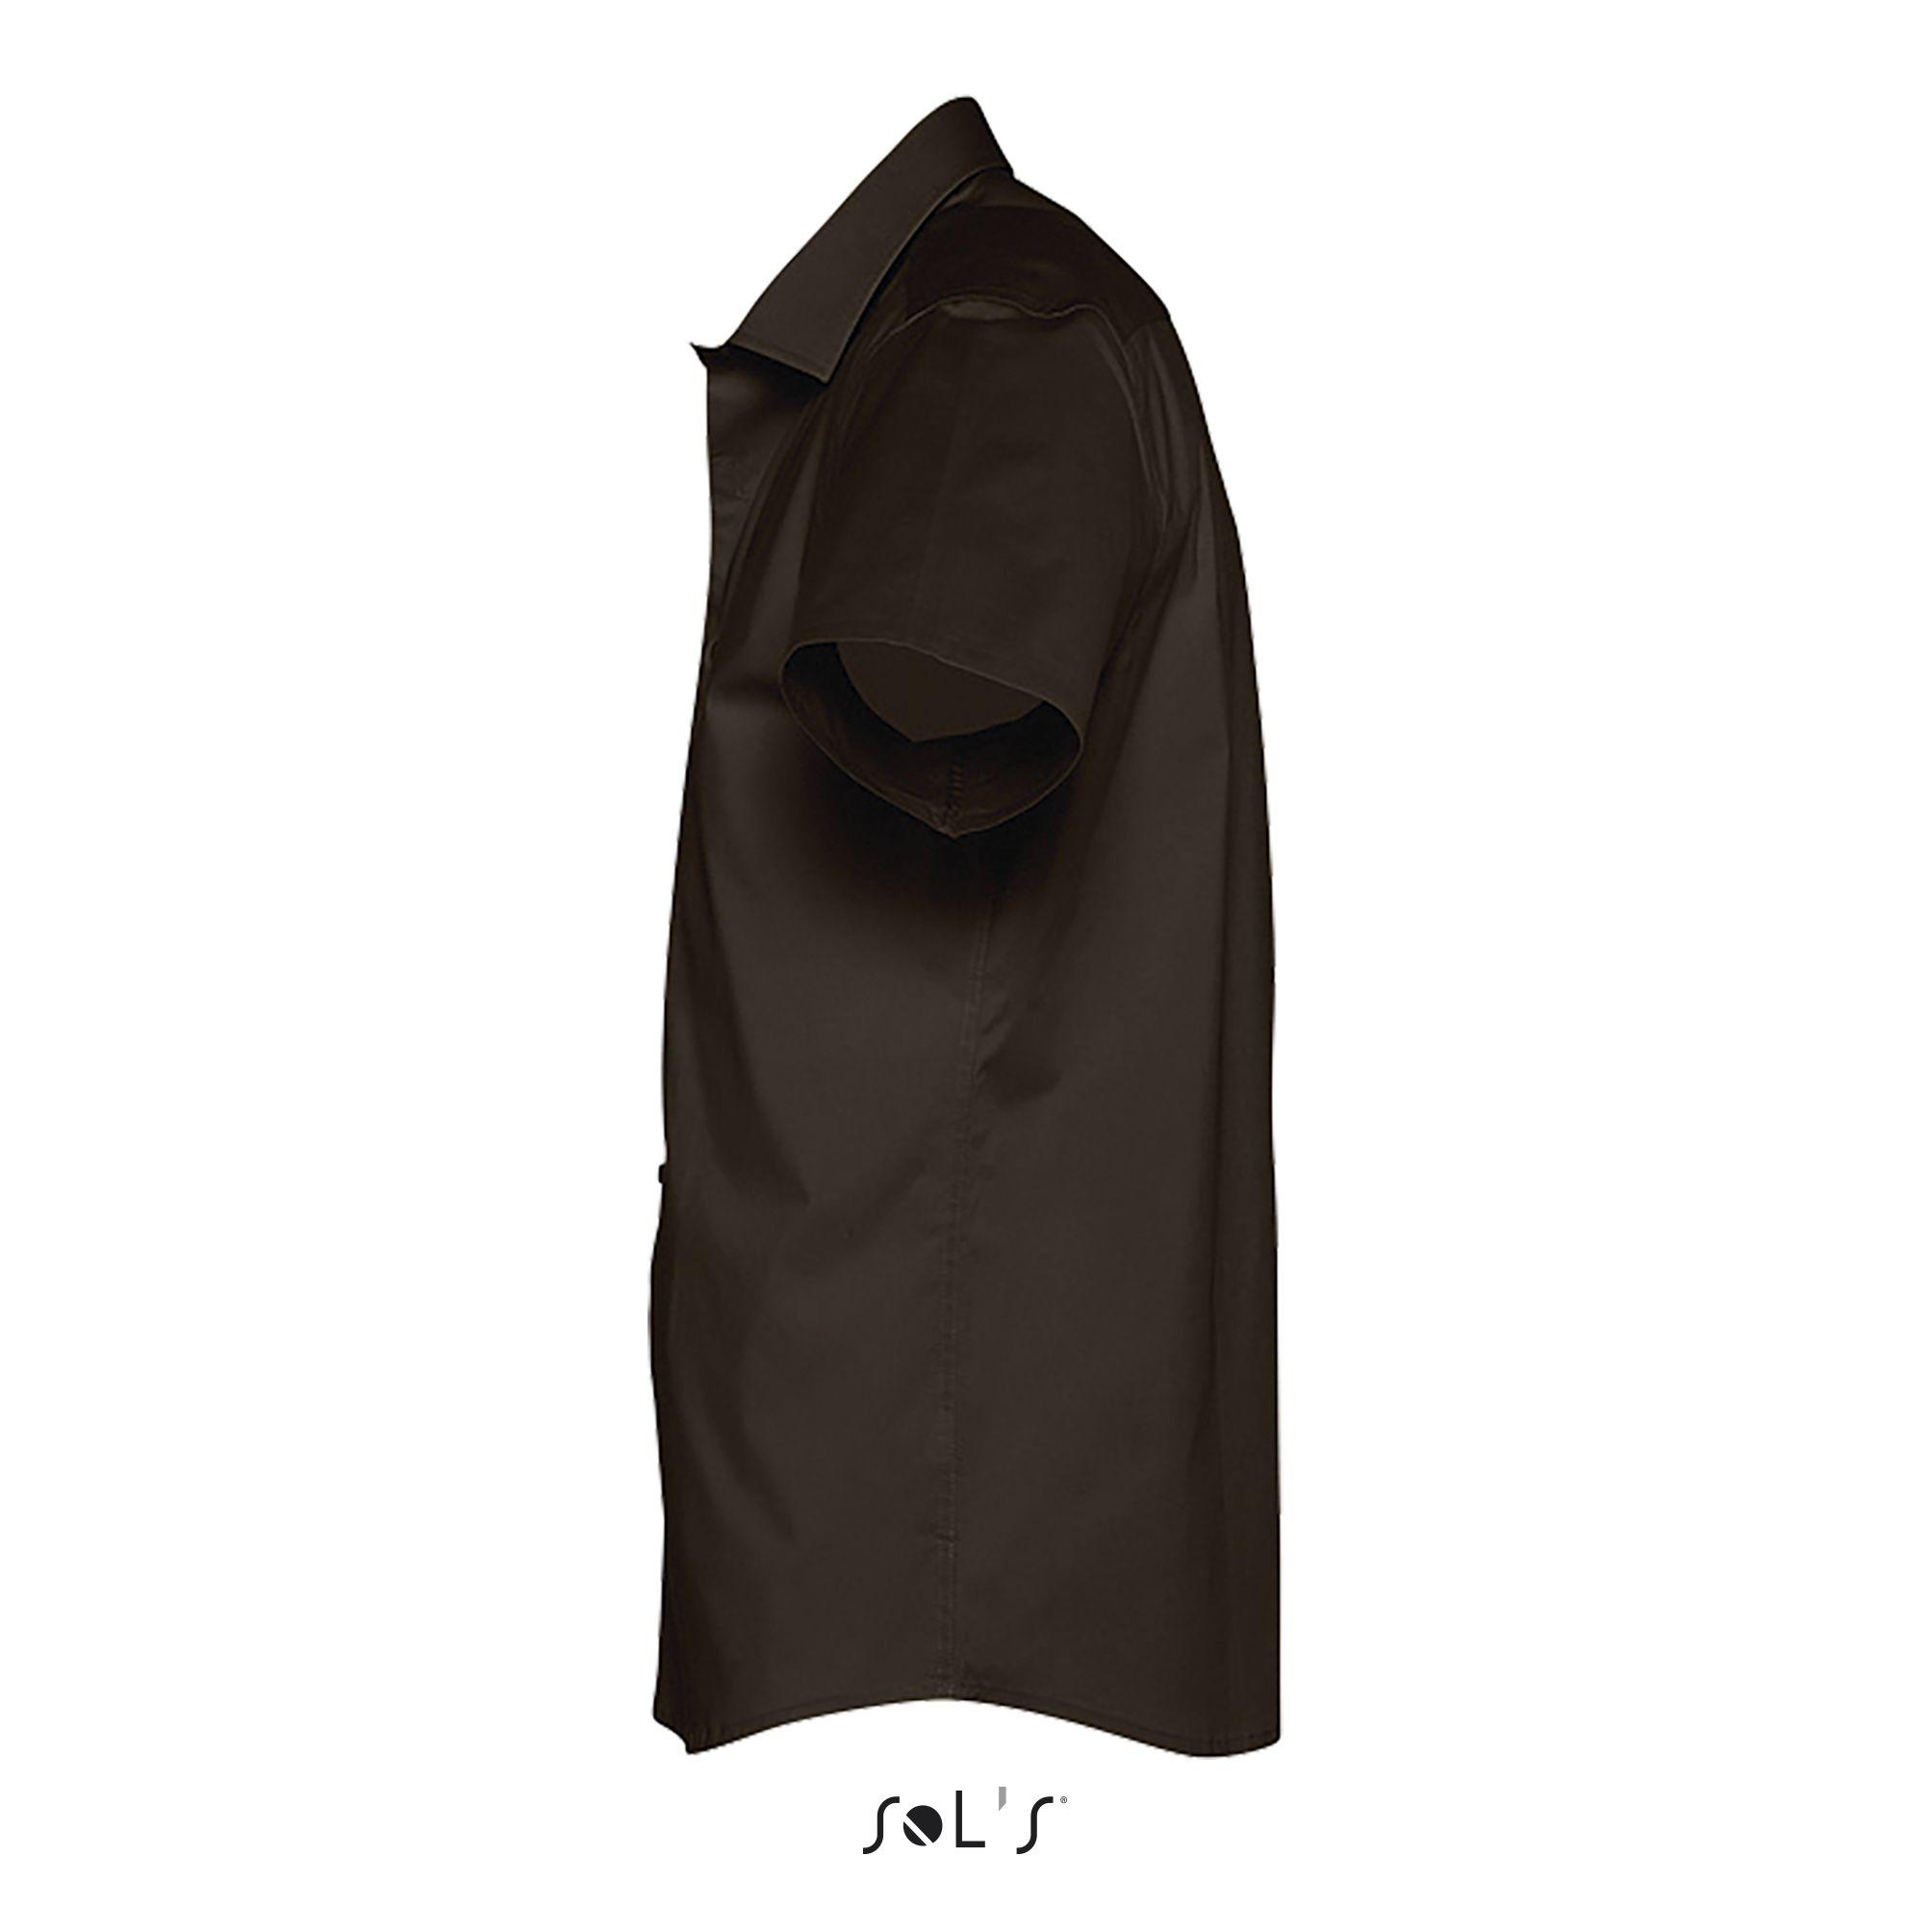 399 - Dark brown